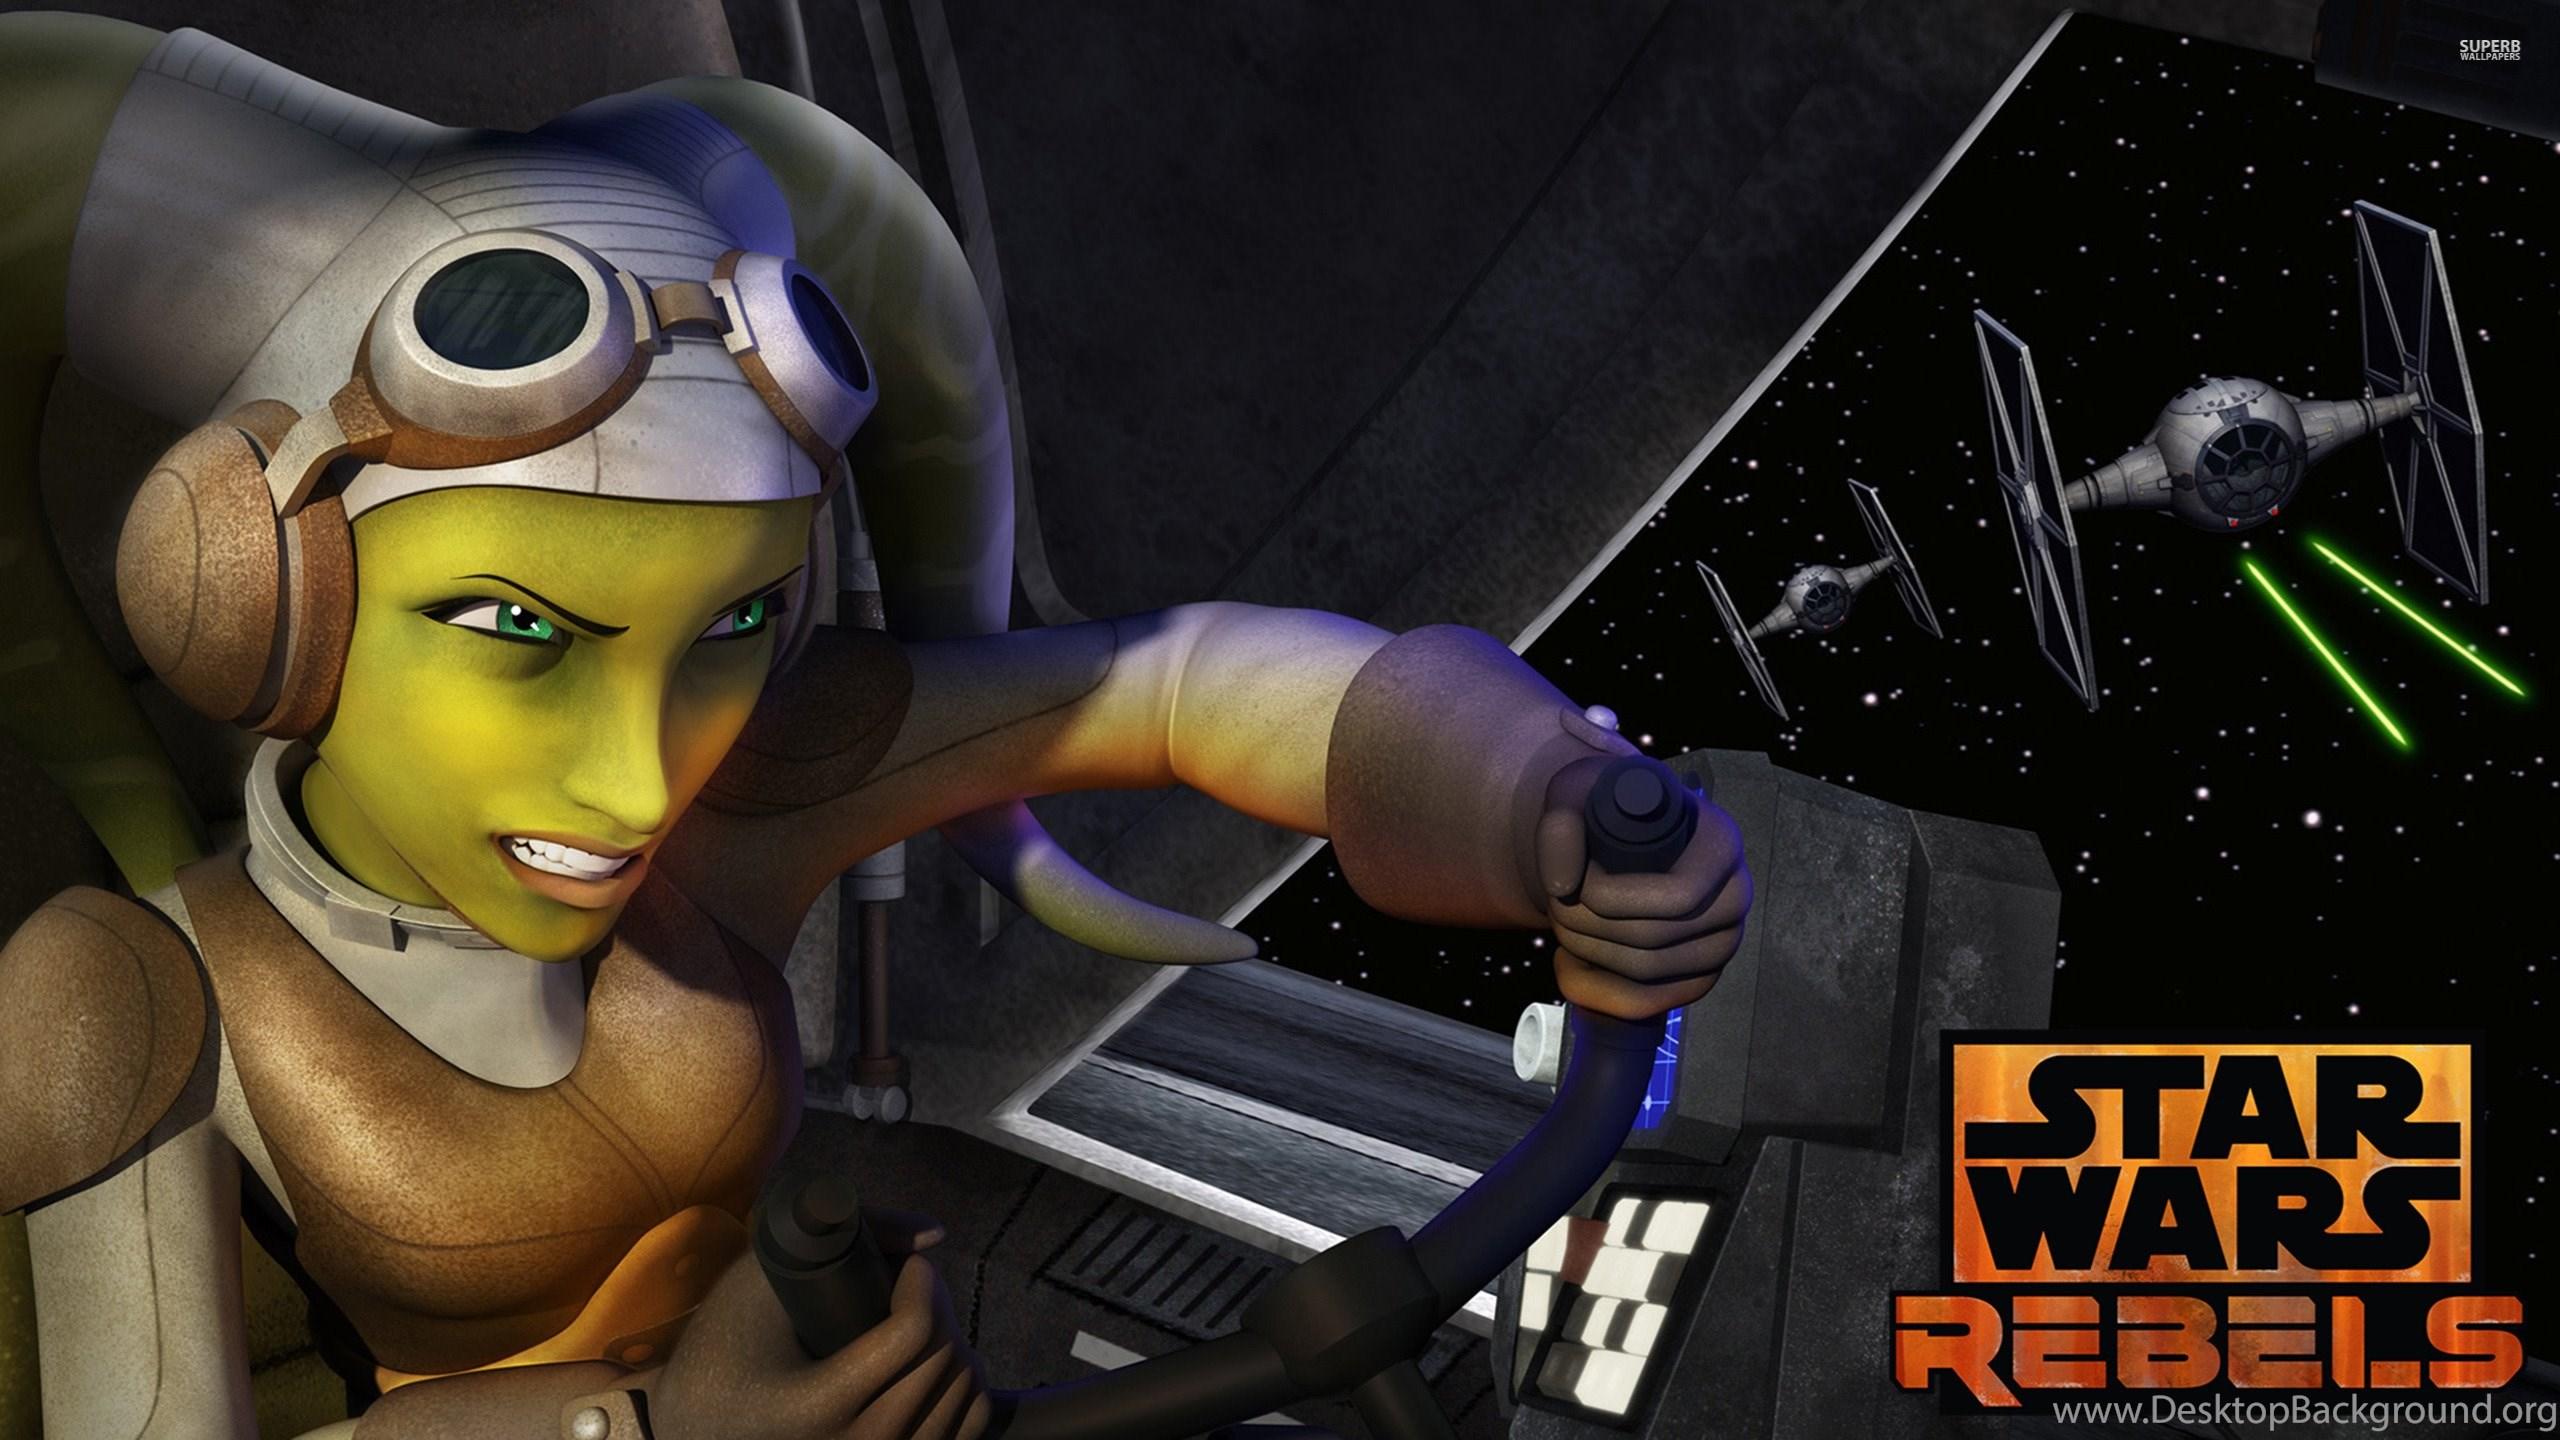 Hera Star Wars Rebels Cartoon Cartoons 2560x1440 Hd Wallpapers